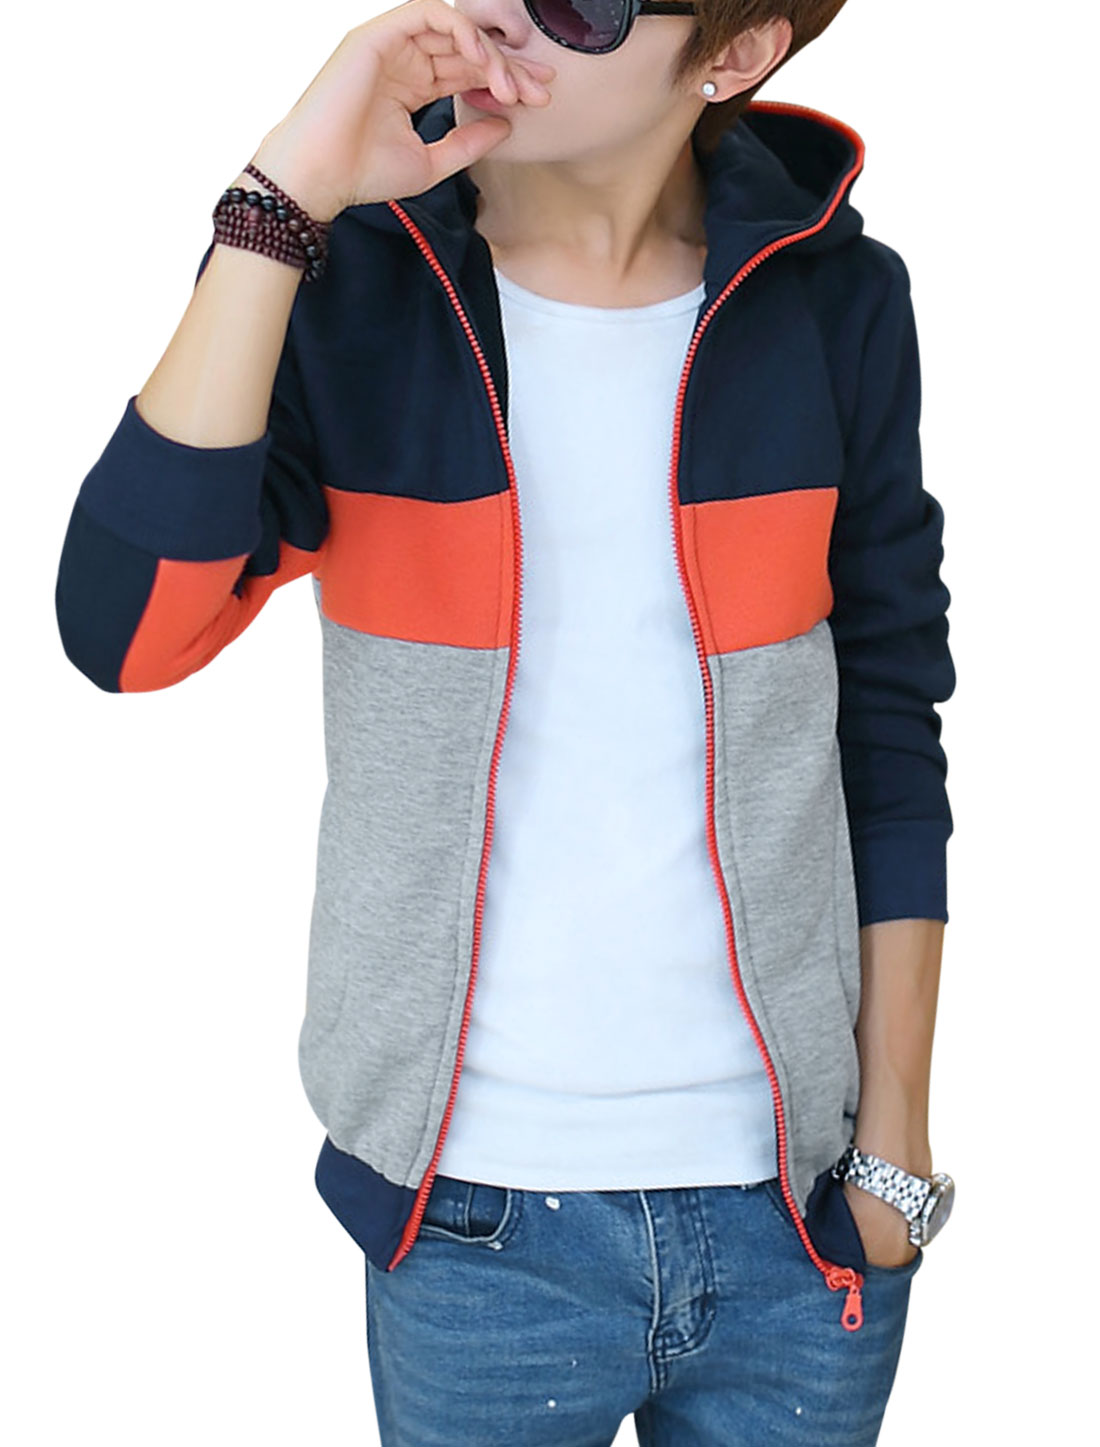 Men Contrast Color Ribbed Trim Zip Up Casual Sweatshirt Navy Blue Grey M